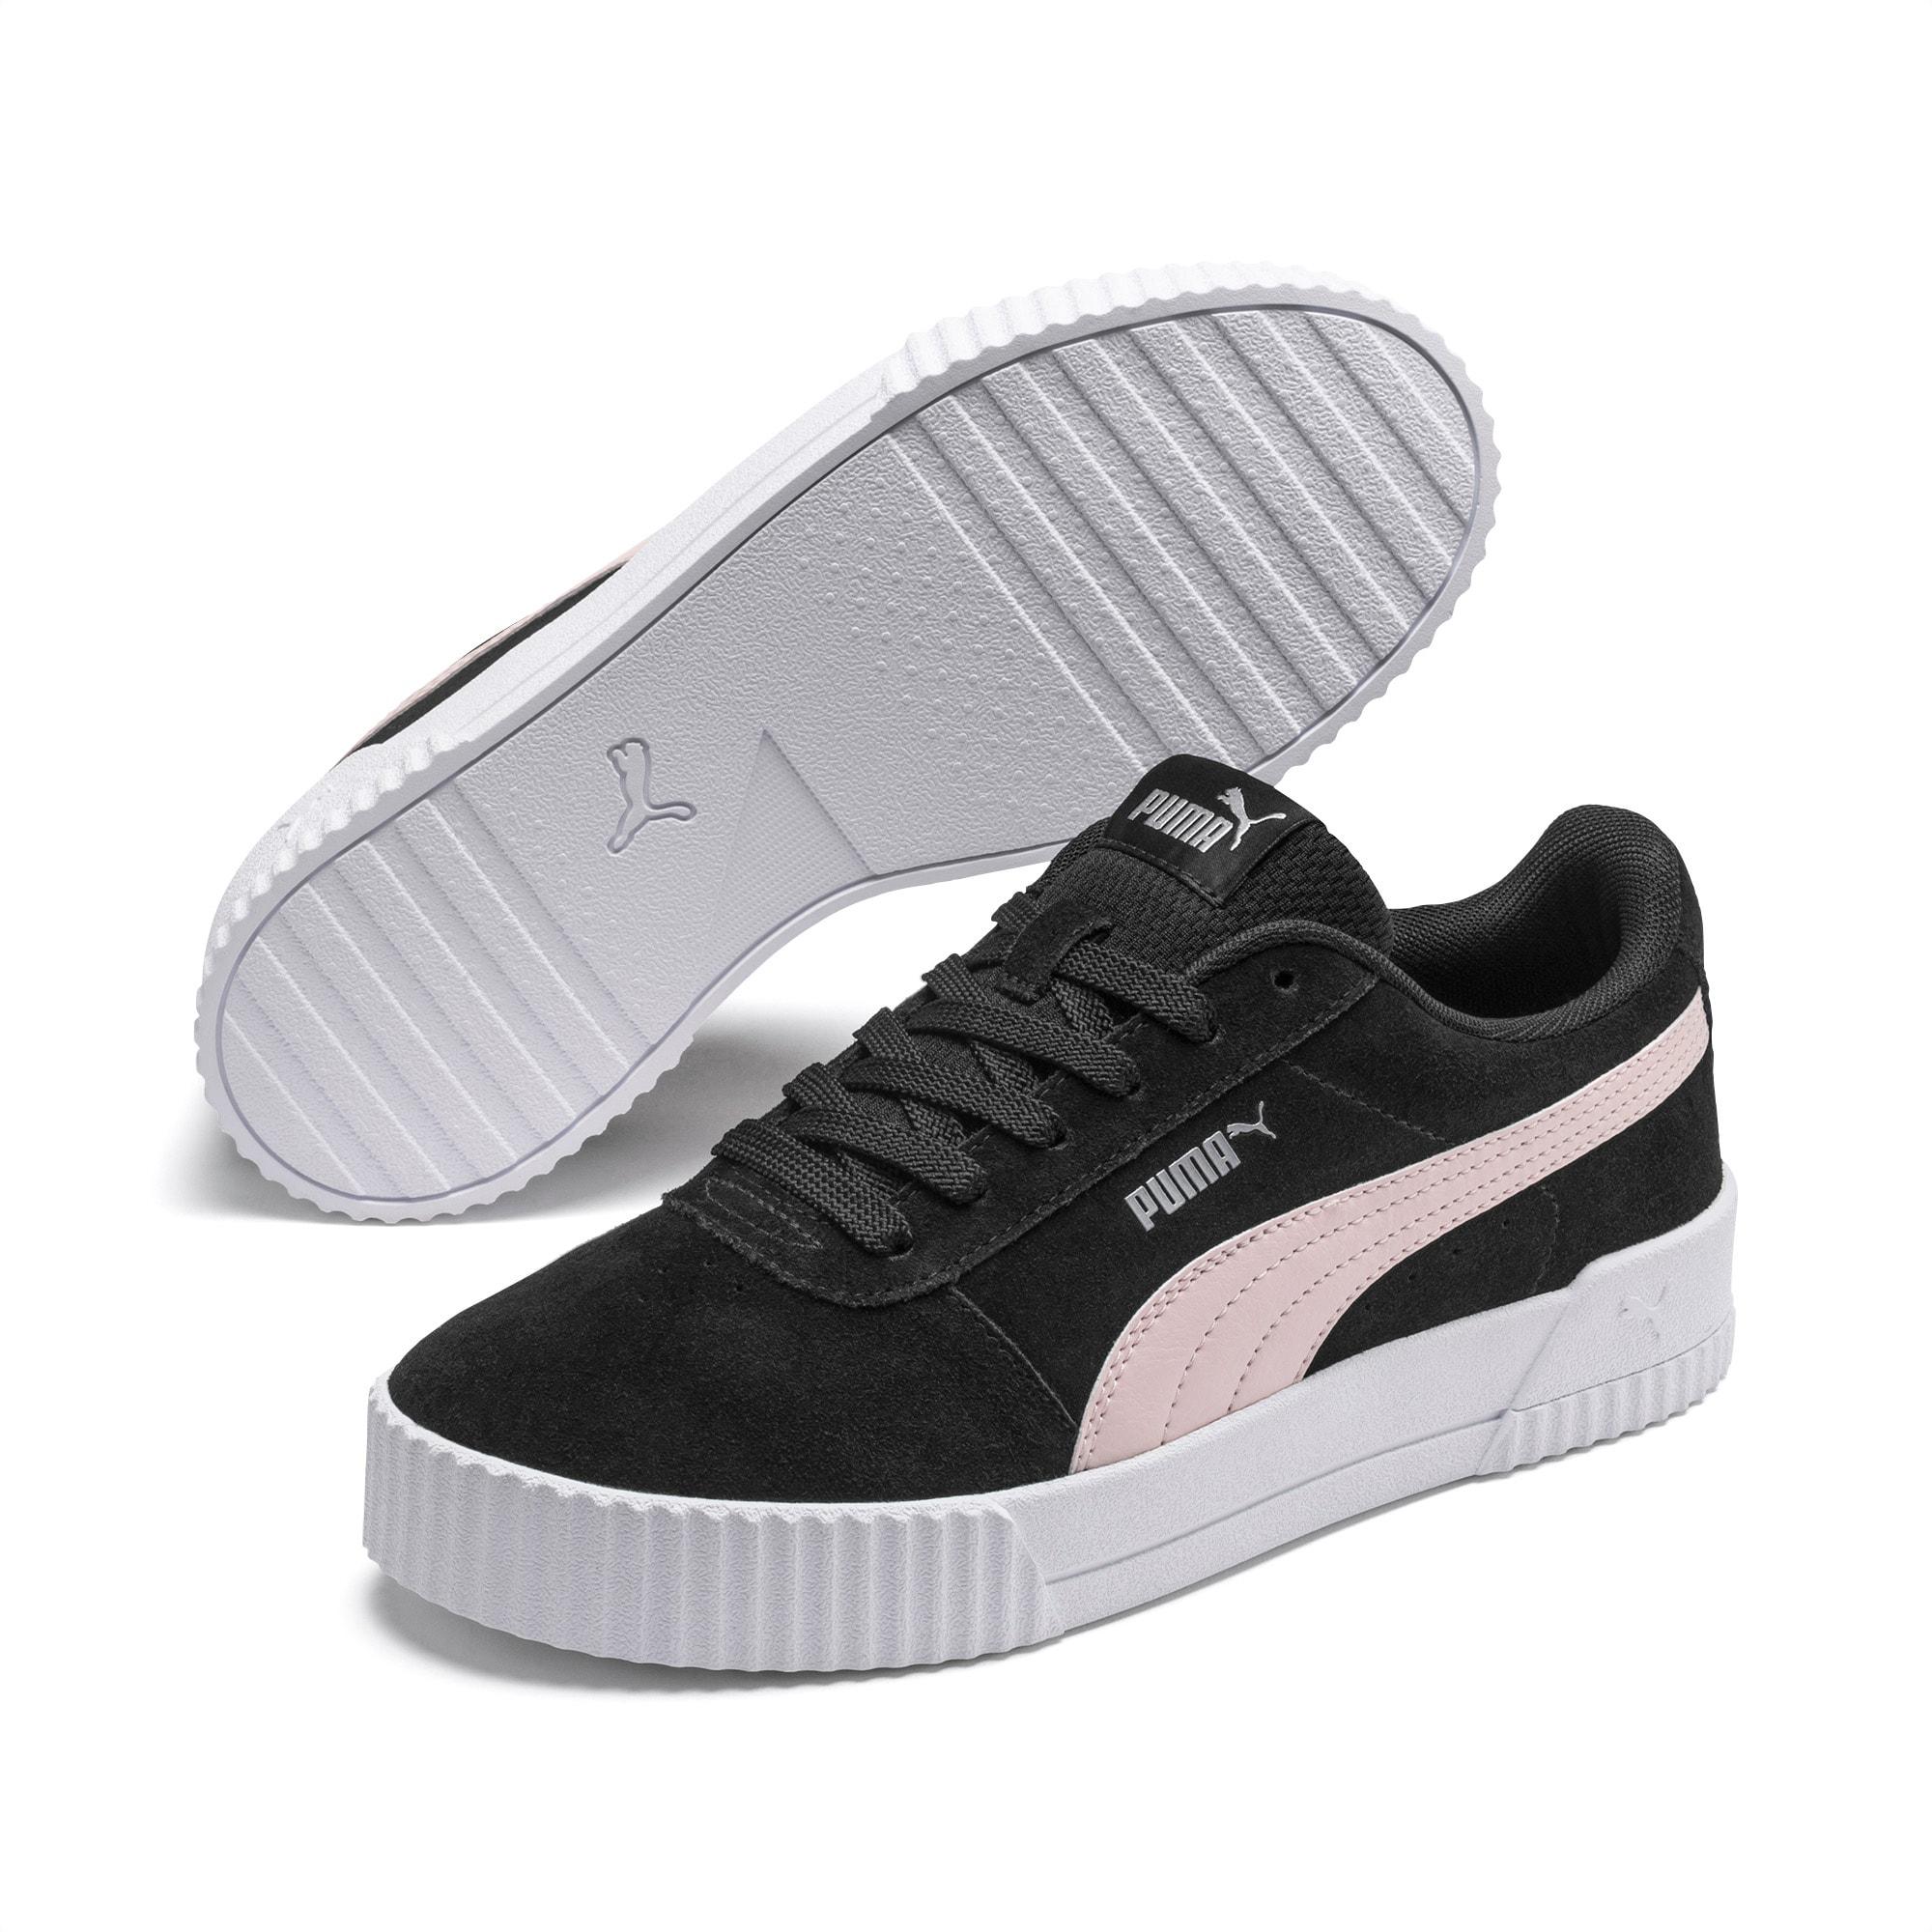 Carina Women's Sneakers